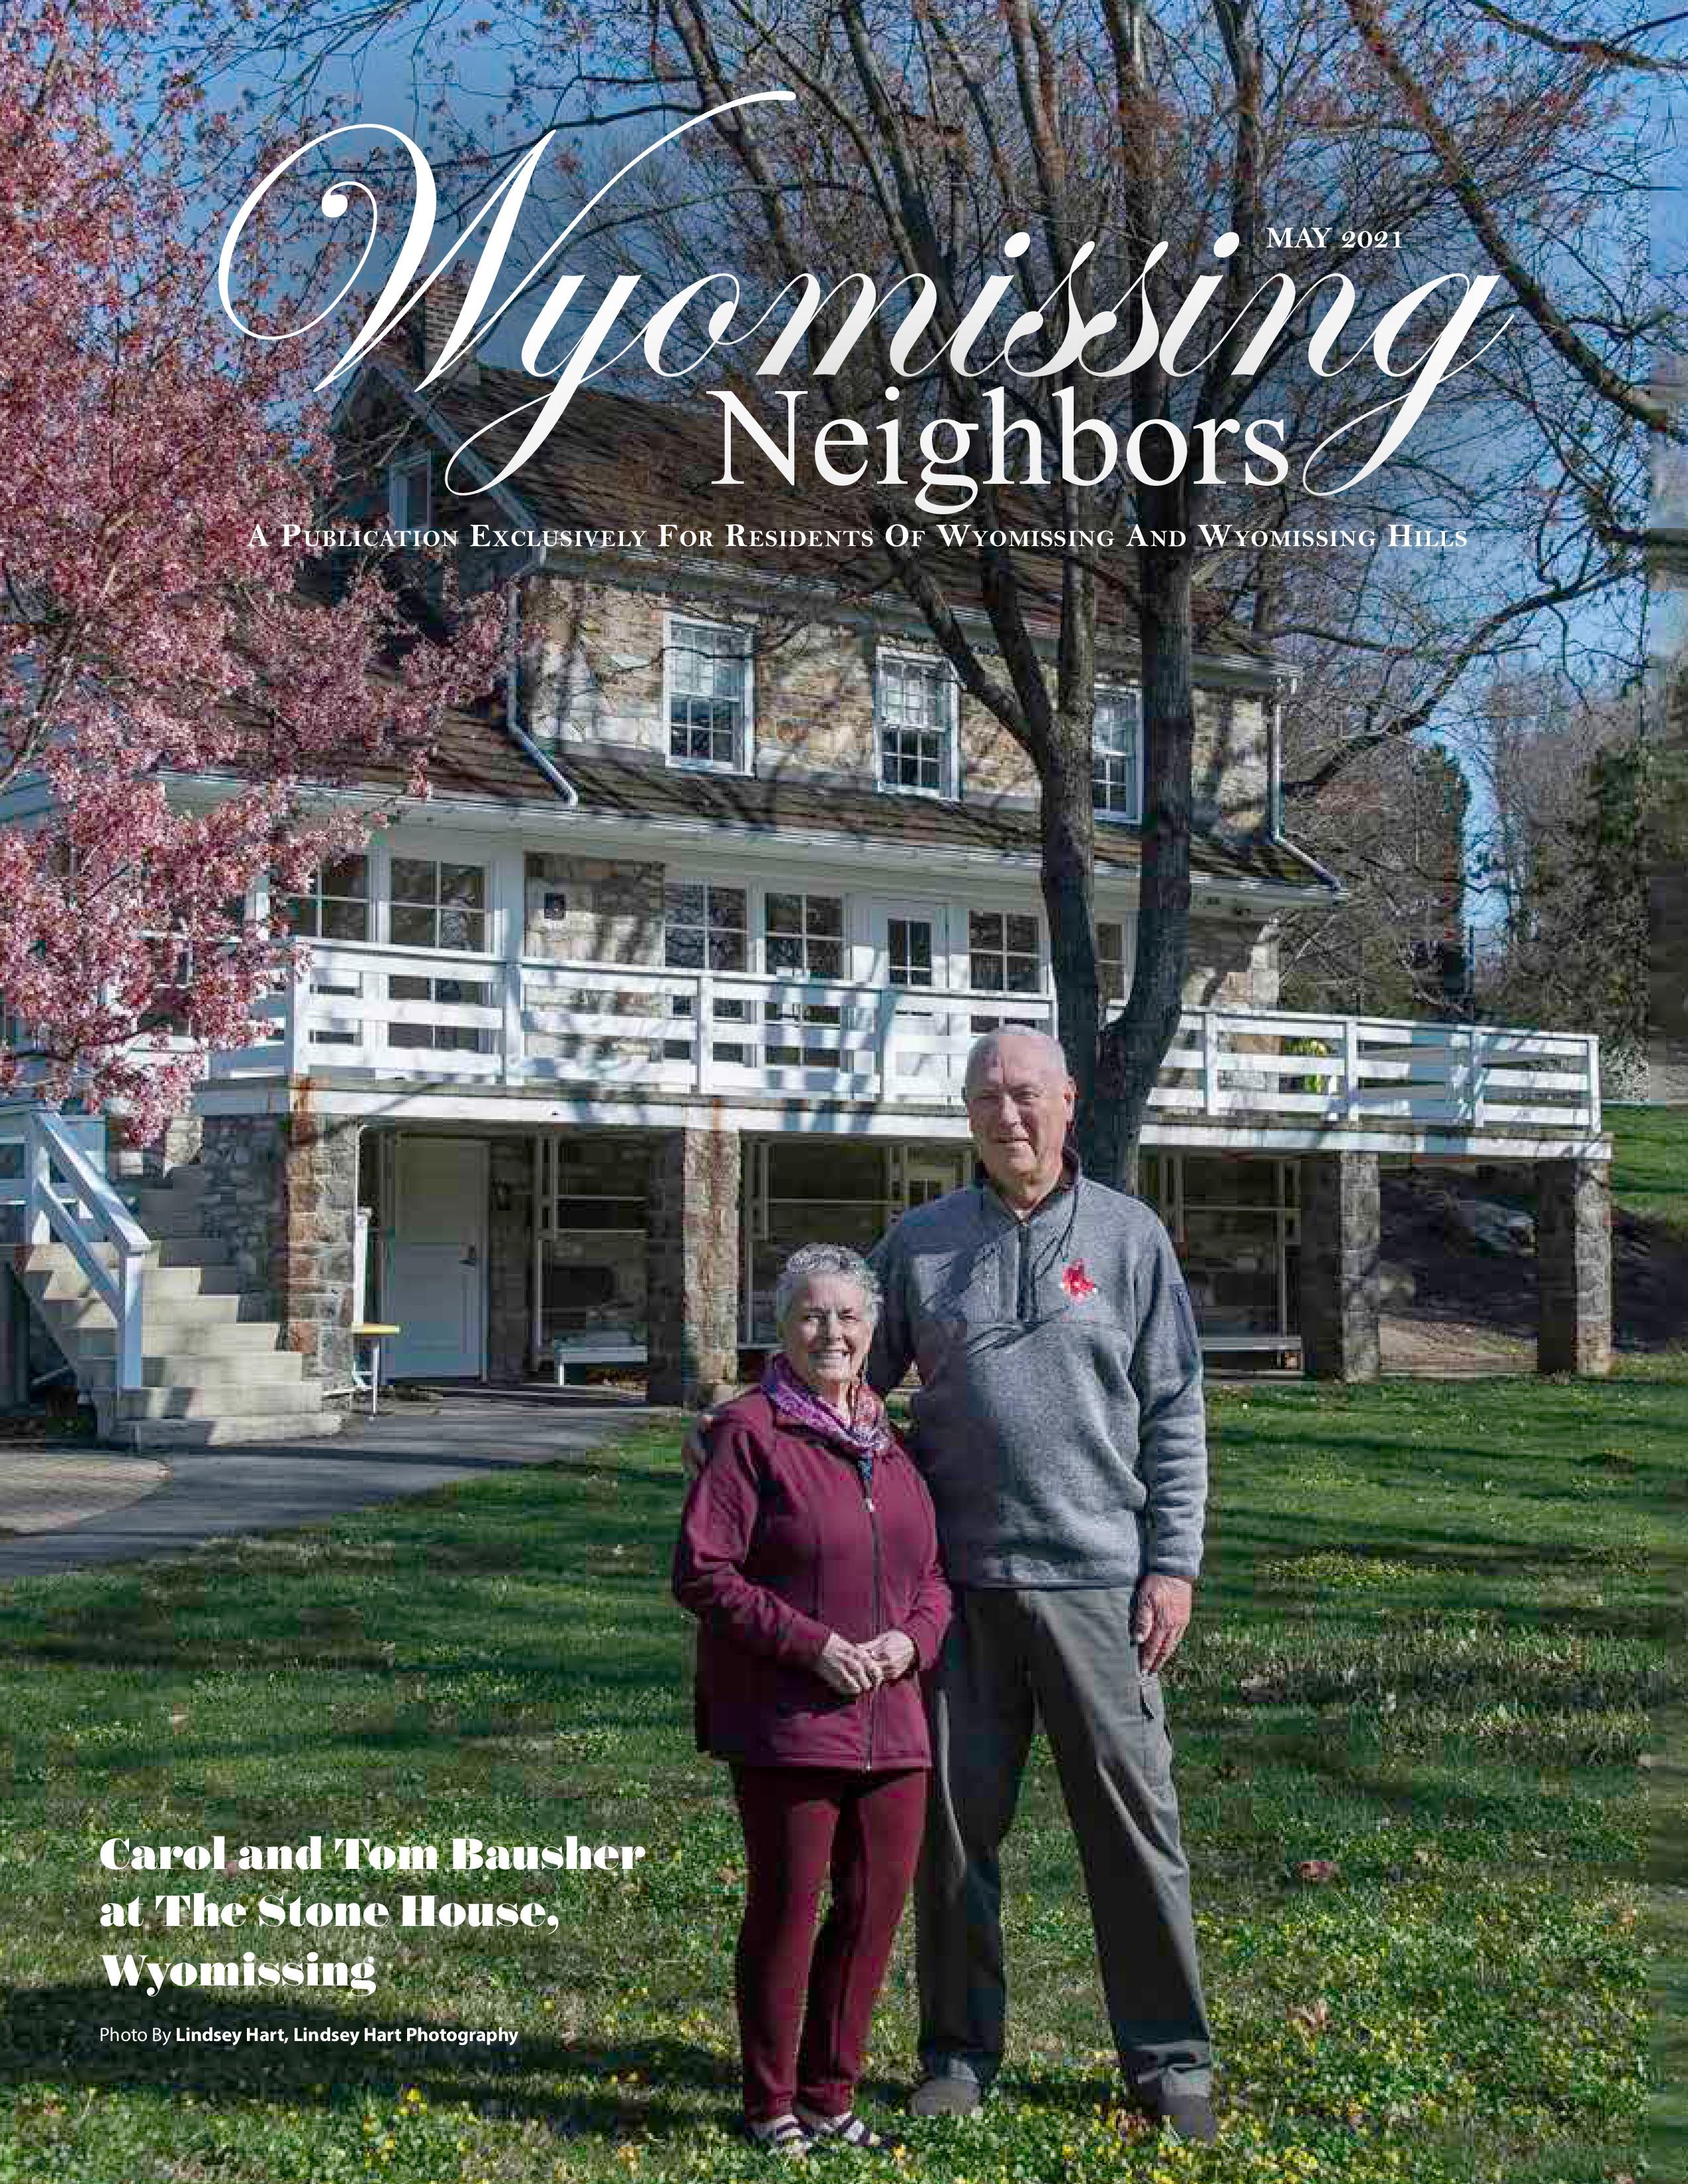 Wyomissing Neighbors 2021-05-01